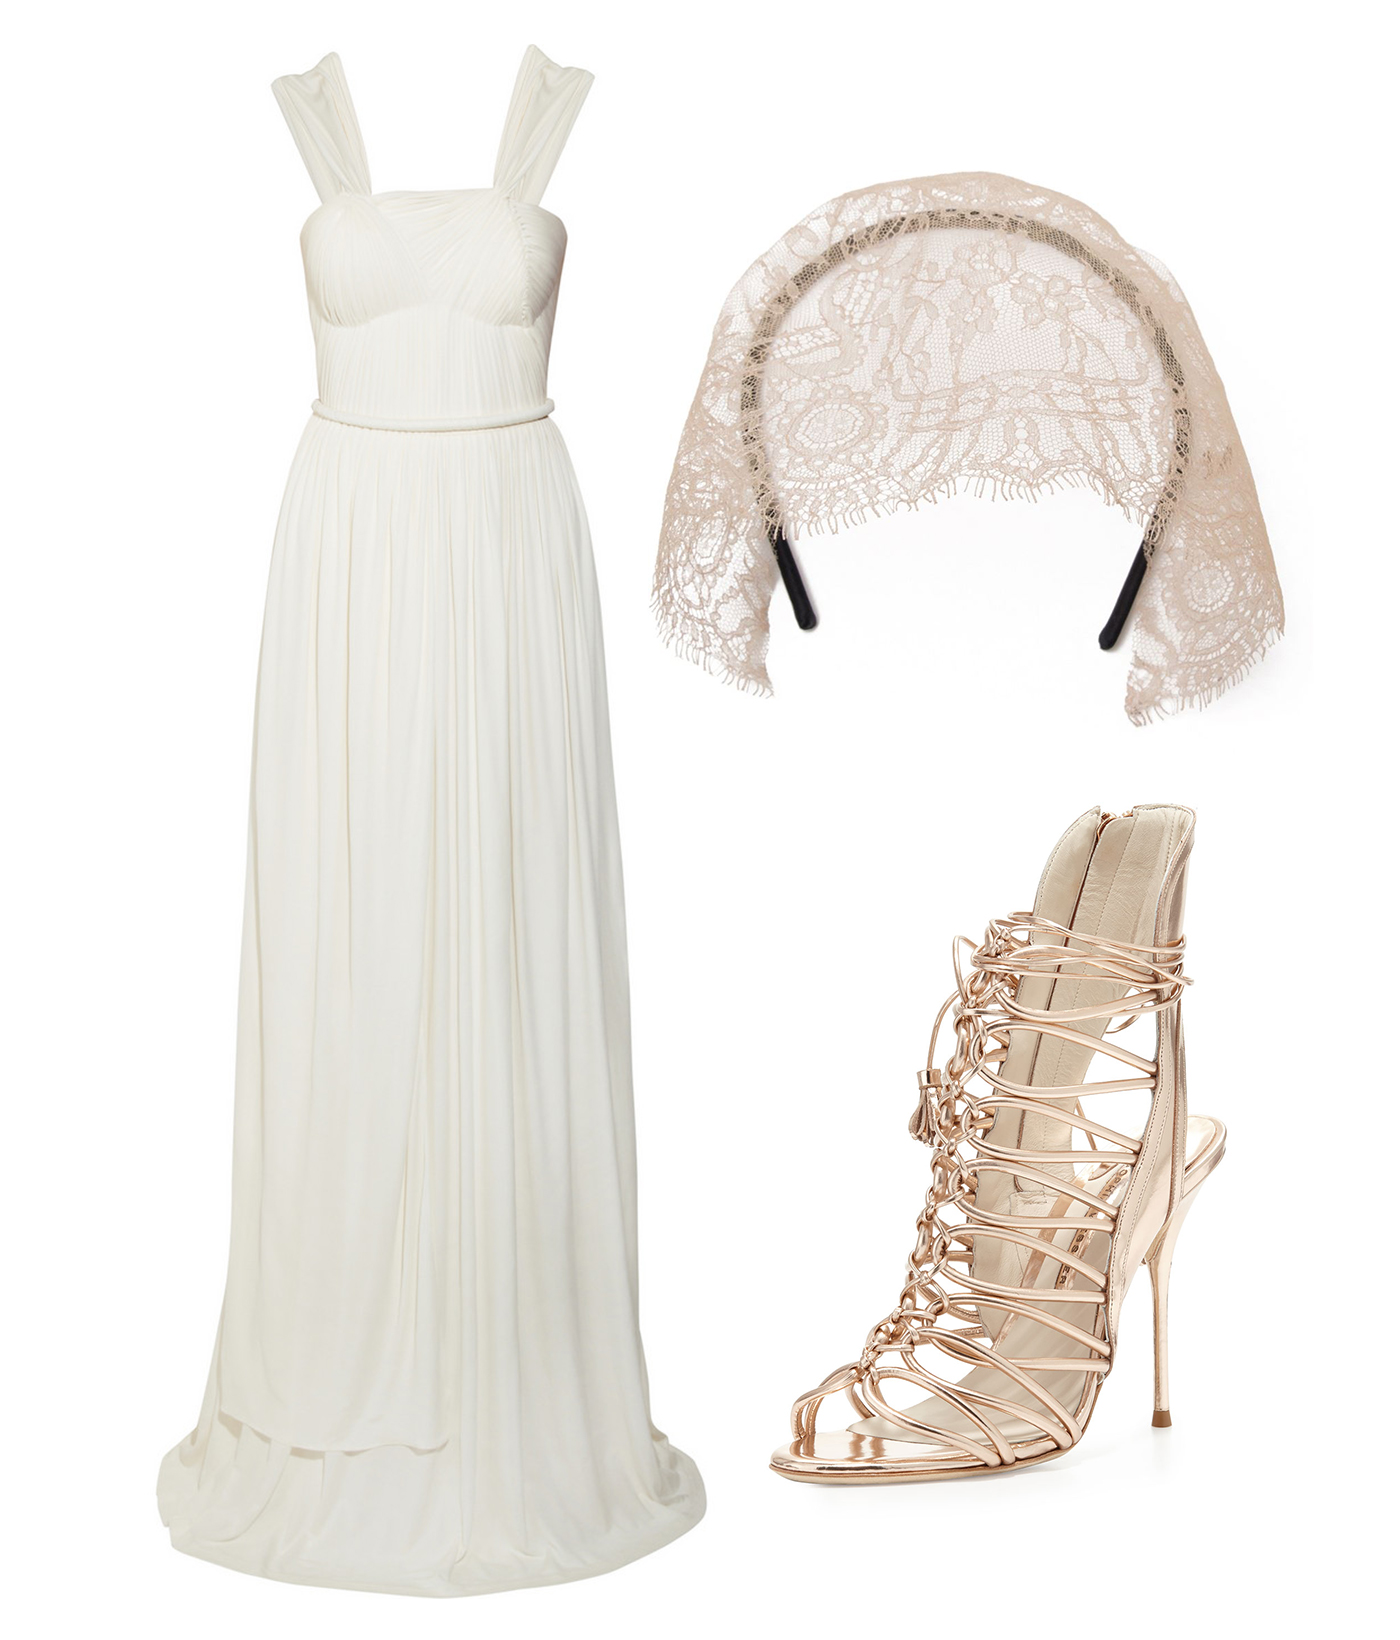 spring-wedding-dresses-accessories-08.jpg